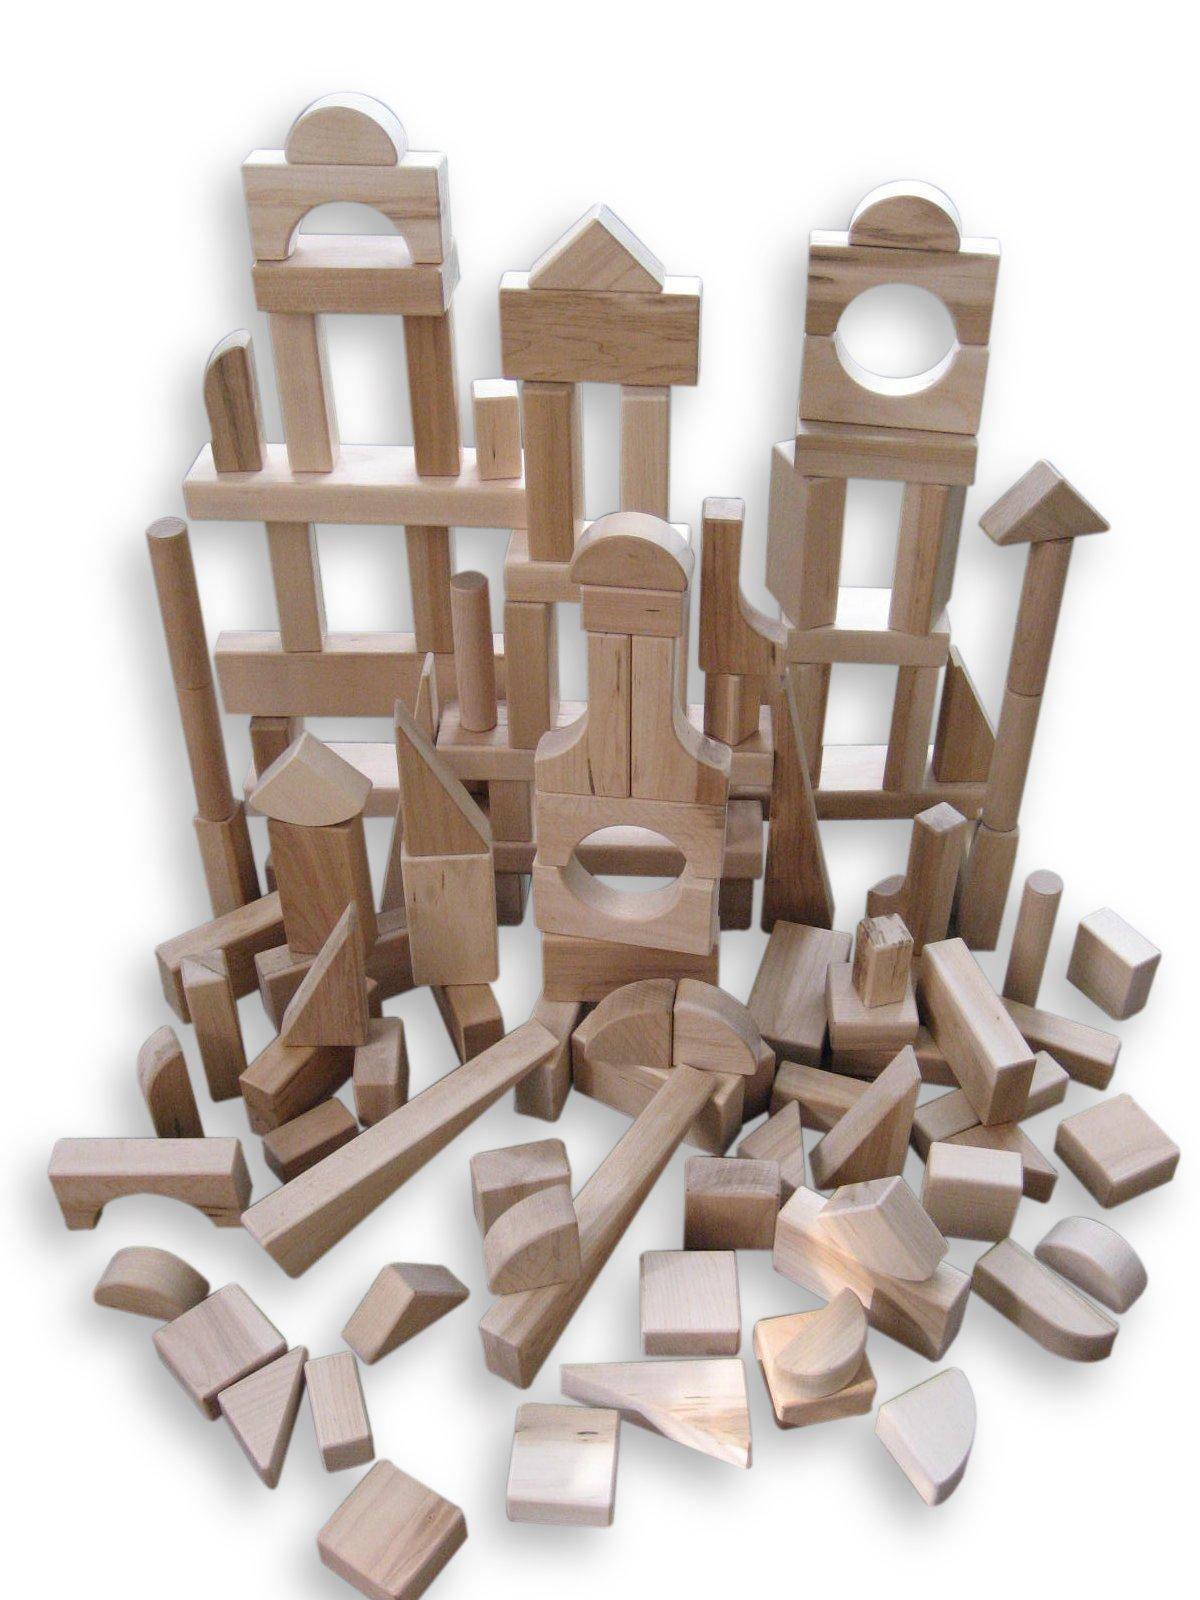 Beka 120-Piece Special Shapes Wooden Blocks